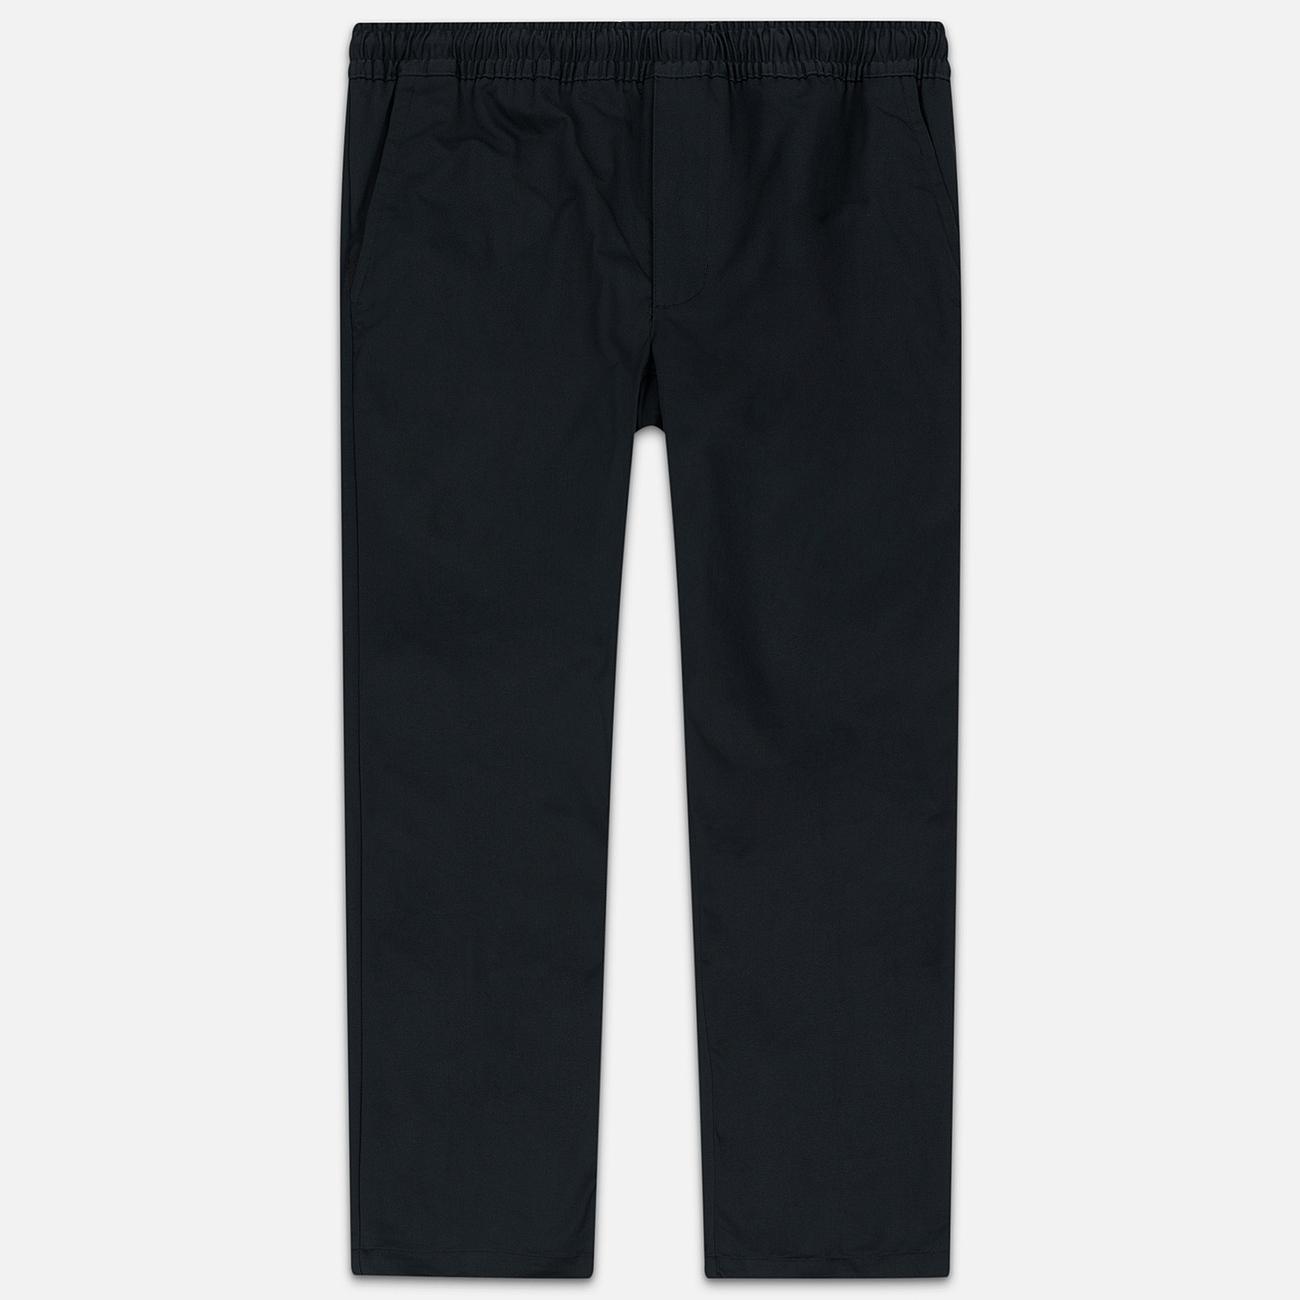 Мужские брюки Nike SB Dri-Fit Pull On Chino Black